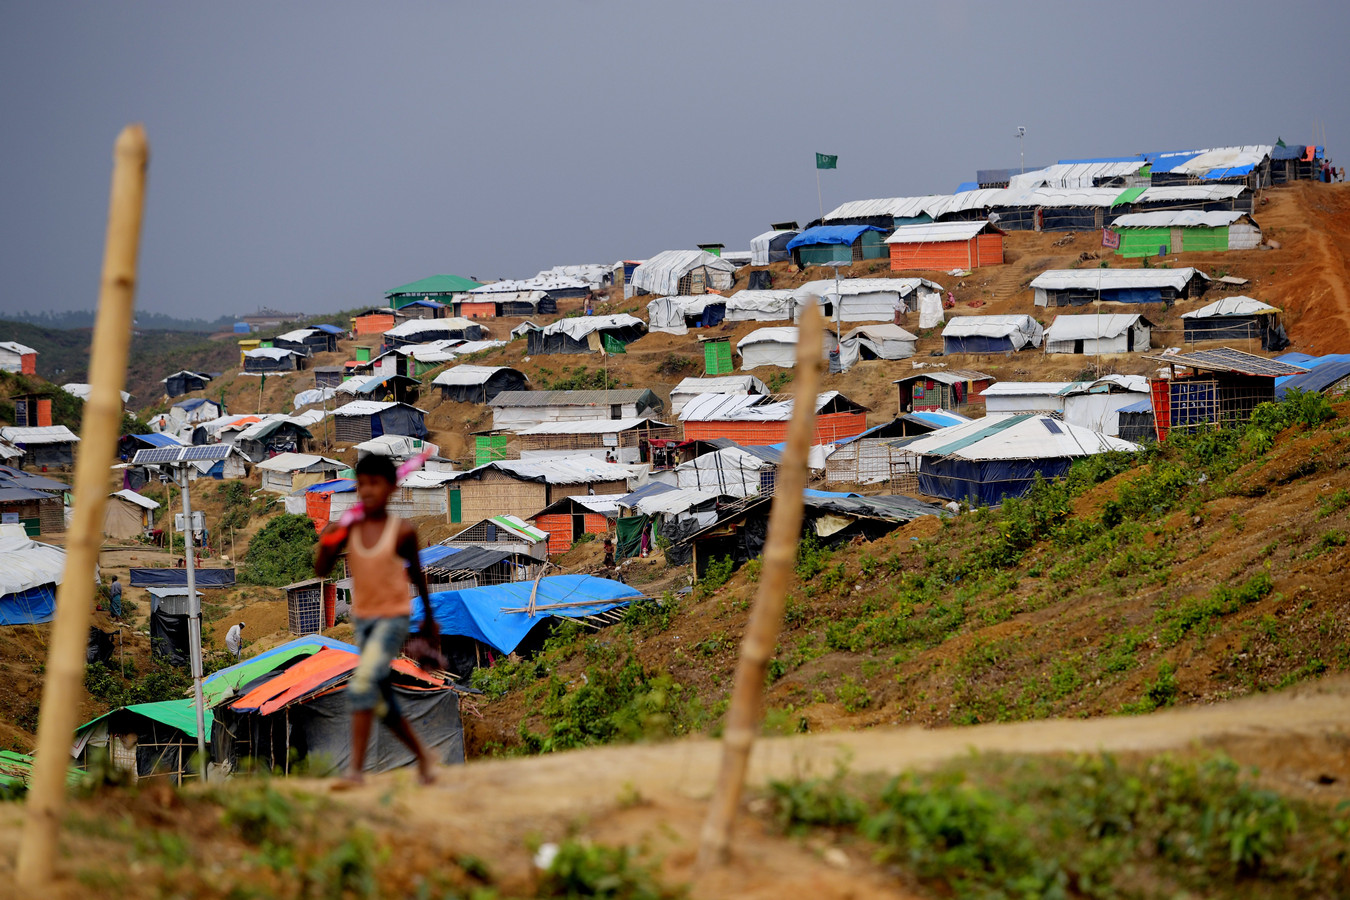 Het kamp Balukhali in Cox's Bazar in Bangladesh.